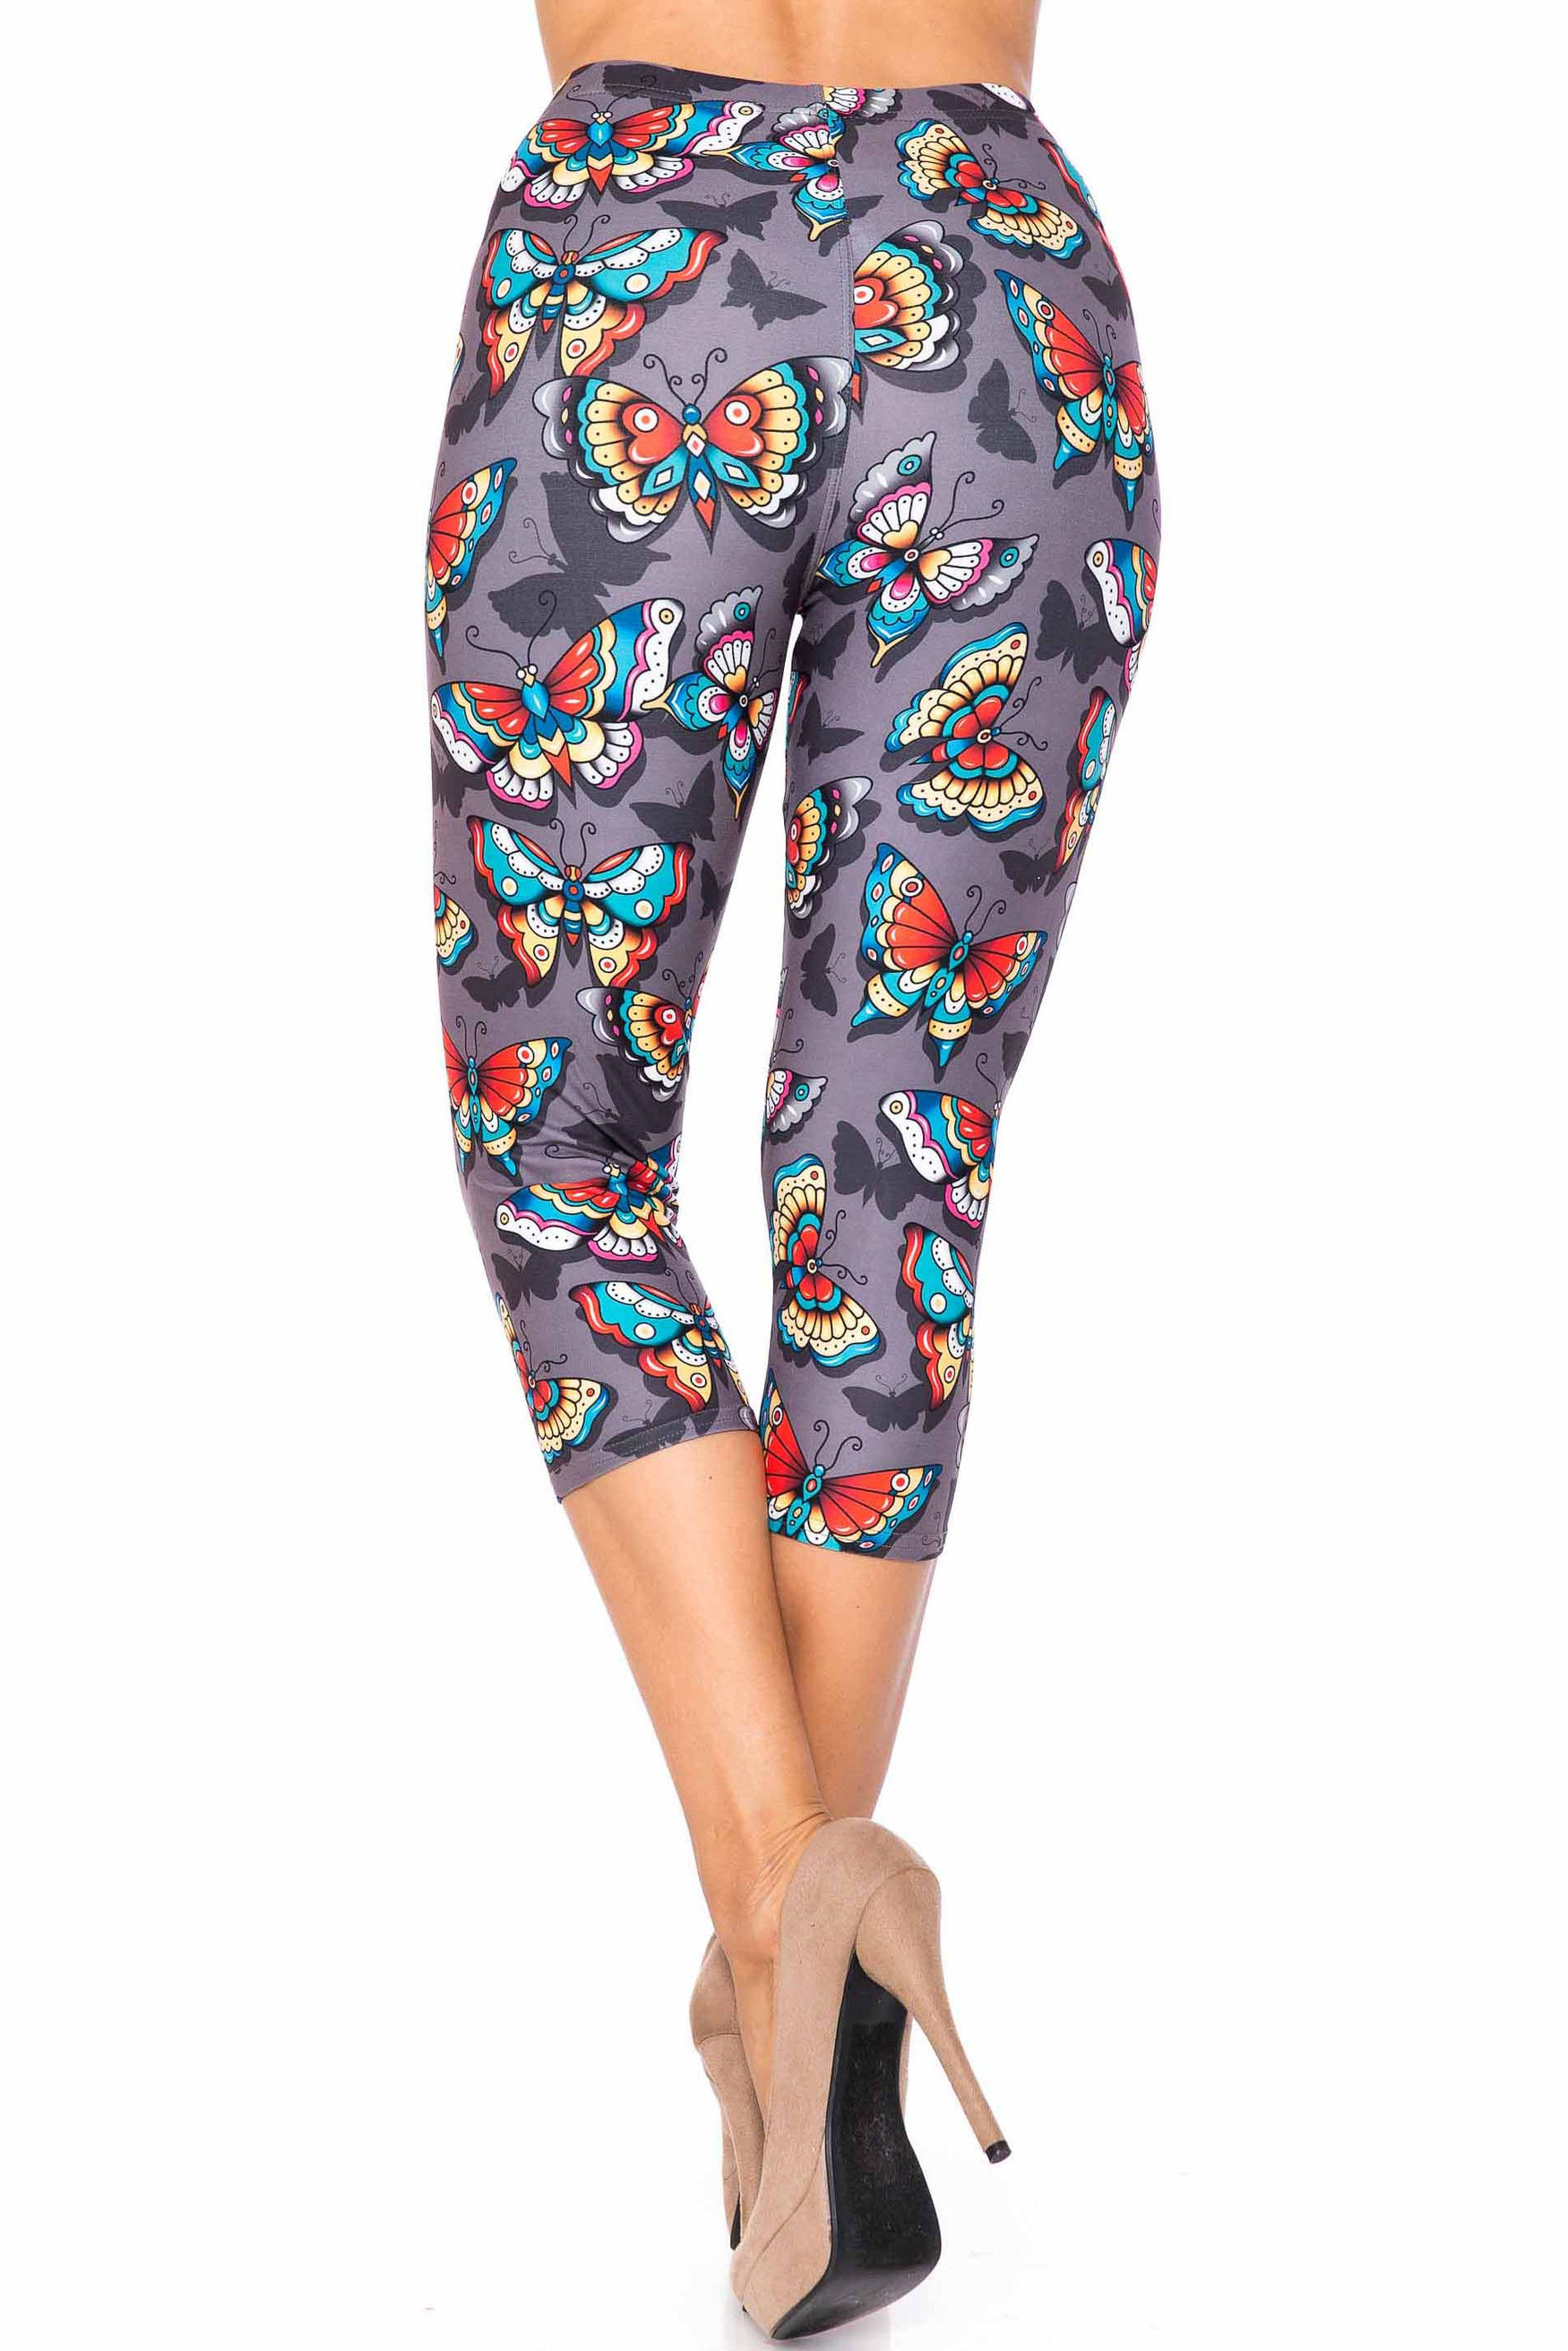 Creamy Soft Jewel Tone Butterfly Capris - USA Fashion™